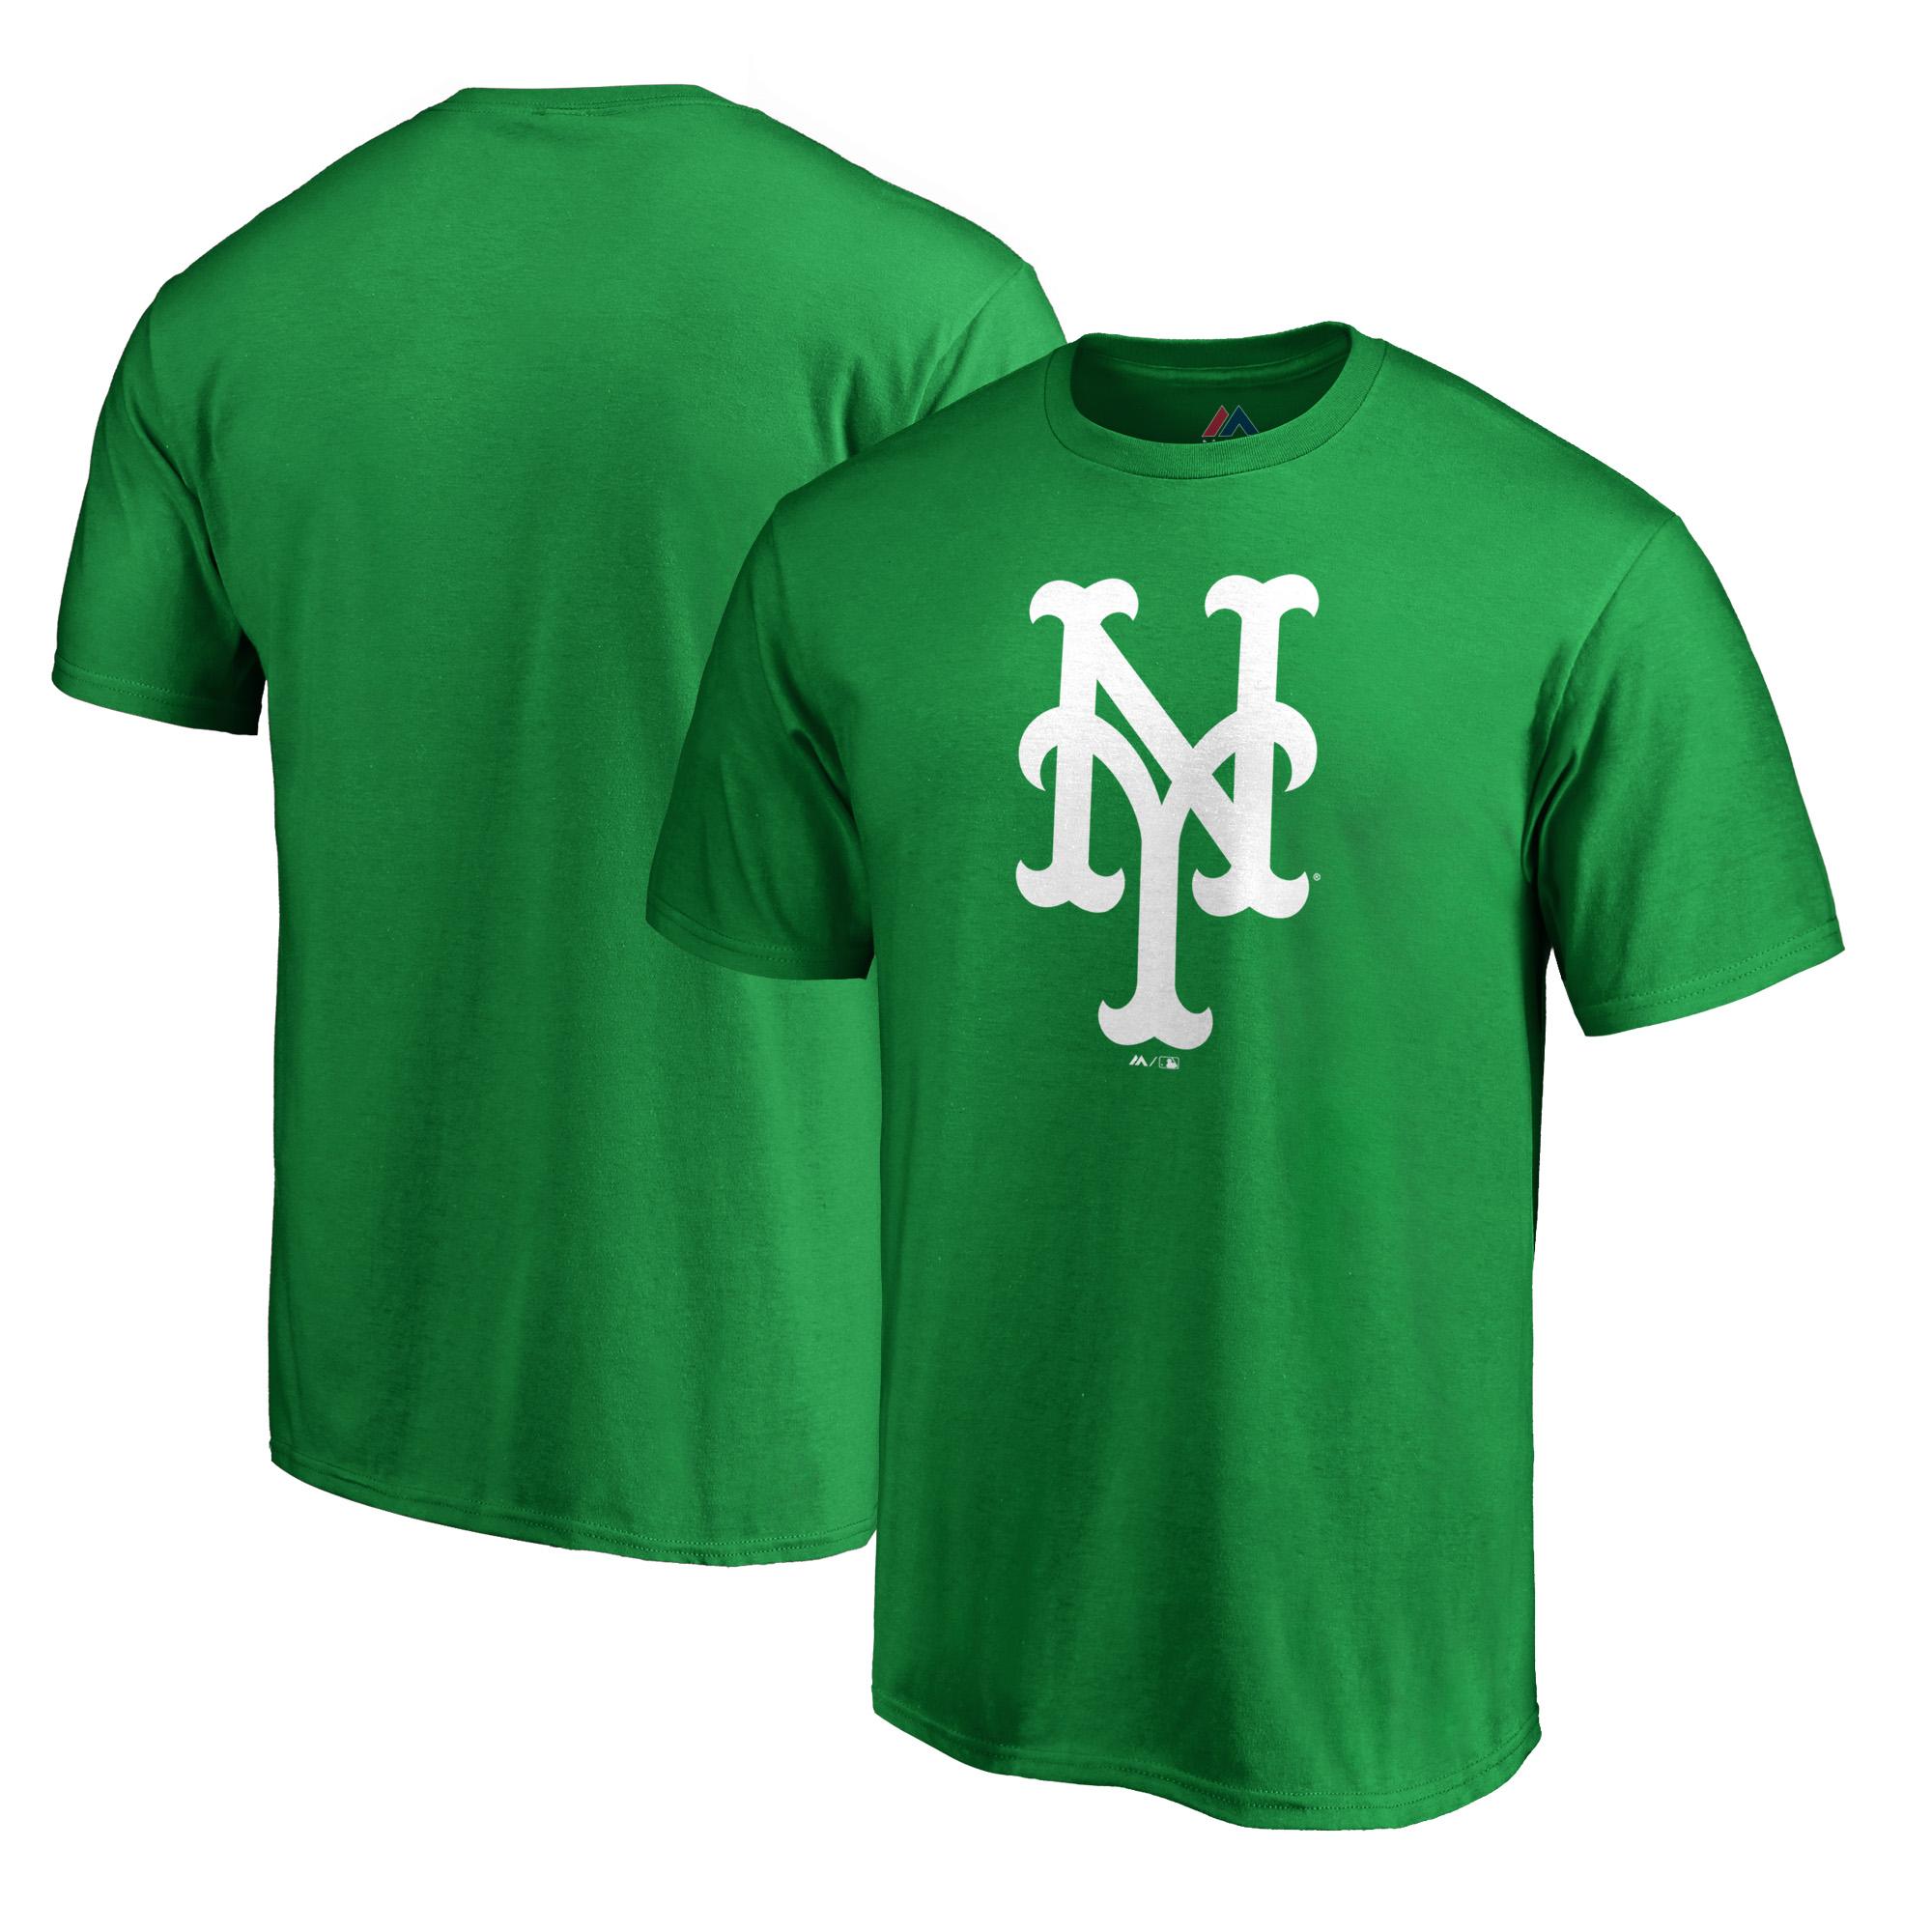 New York Mets Majestic 2019 St. Patrick's Day White Logo T-Shirt - Green